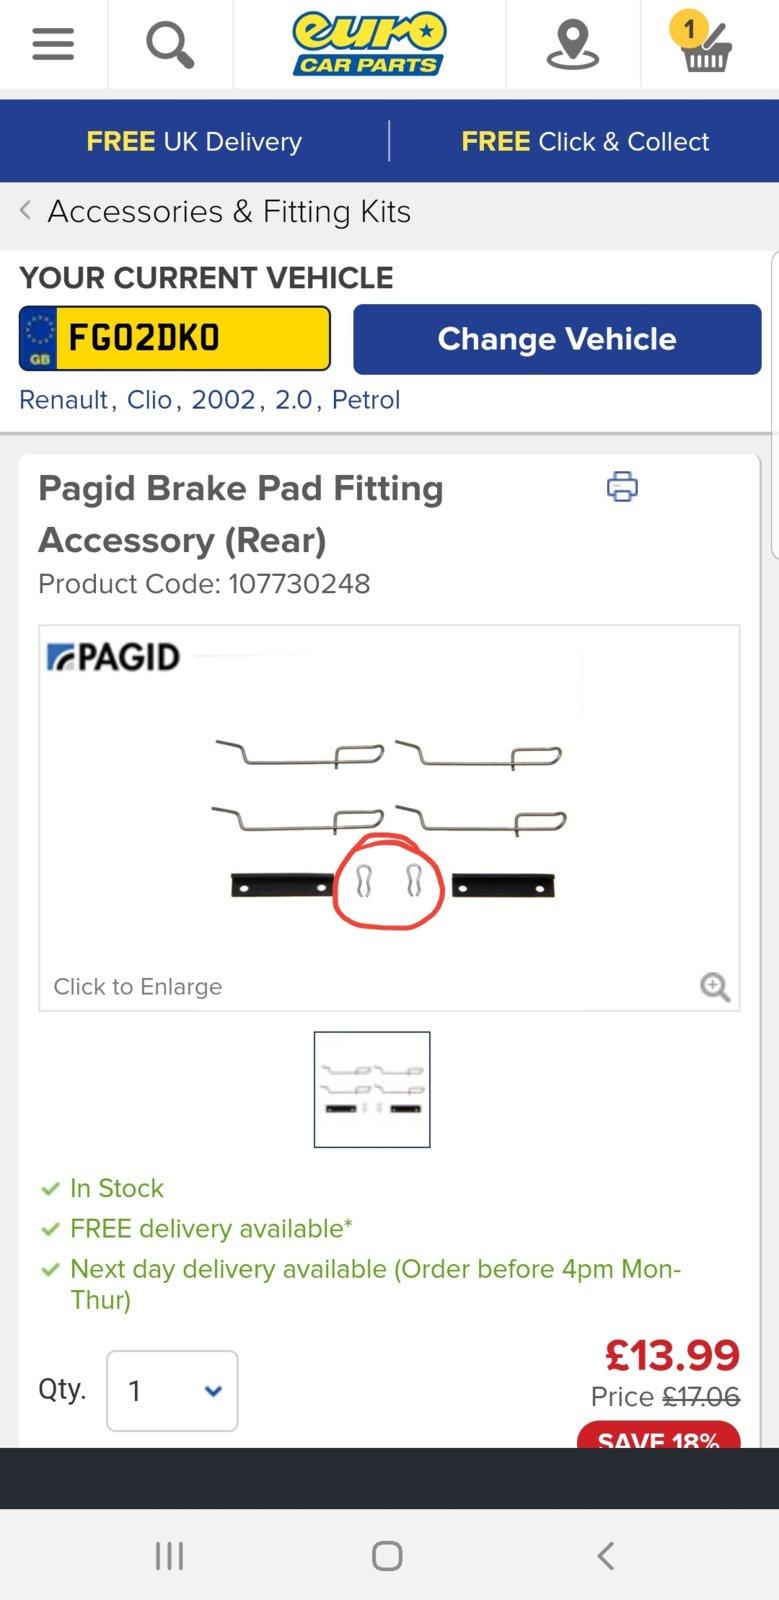 Screenshot_20190613-043942_Euro Car Parts.jpg